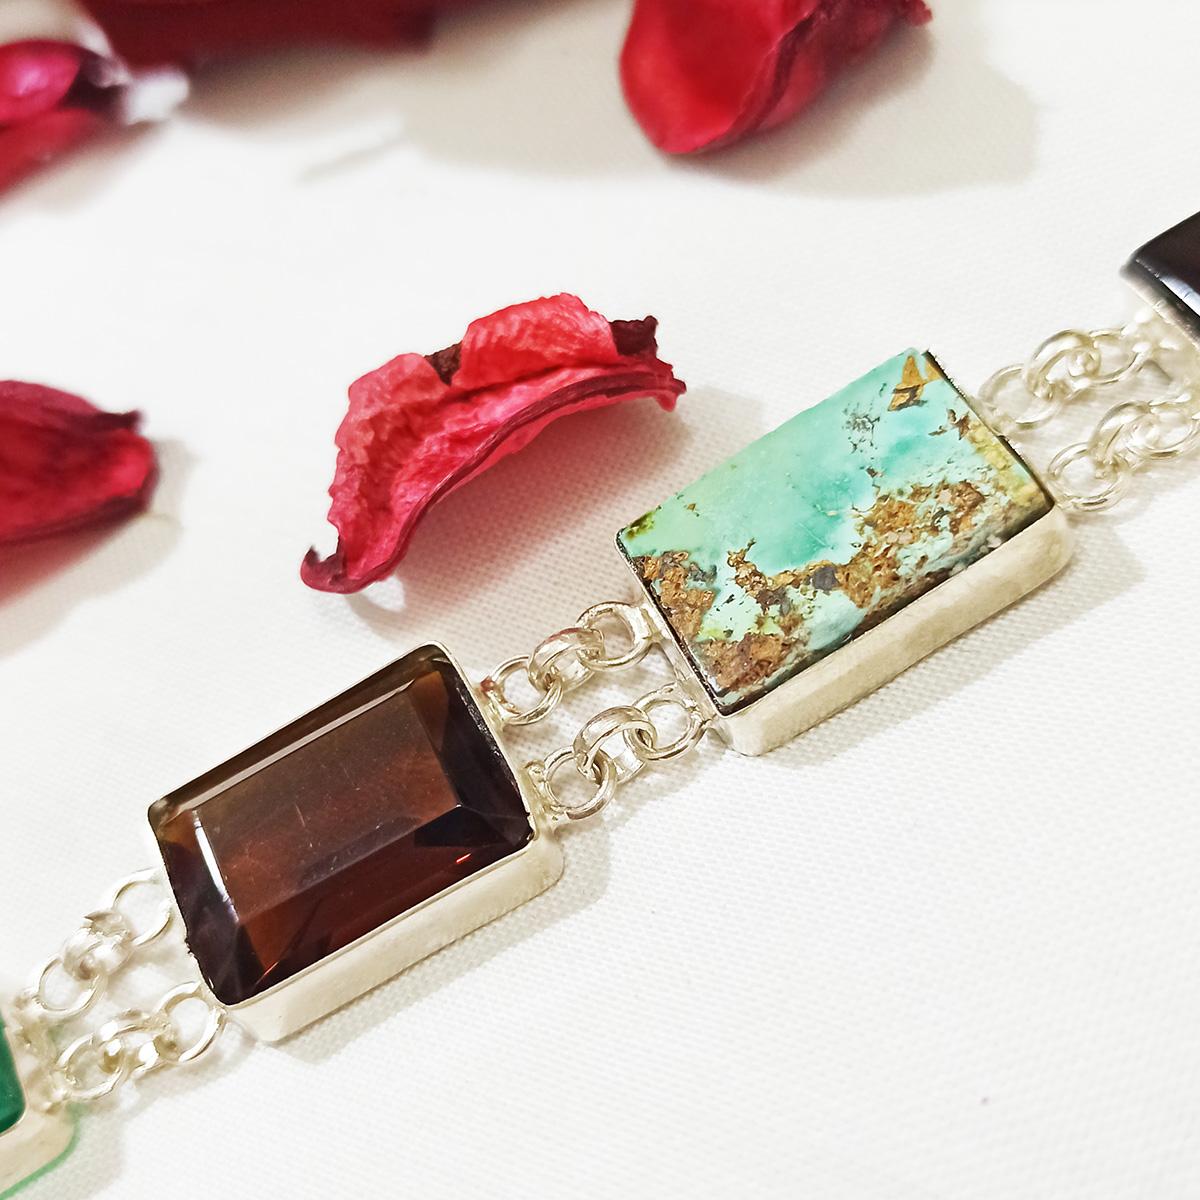 دستبند نقره زنانه سلین کالا مدل جواهری ce-As121